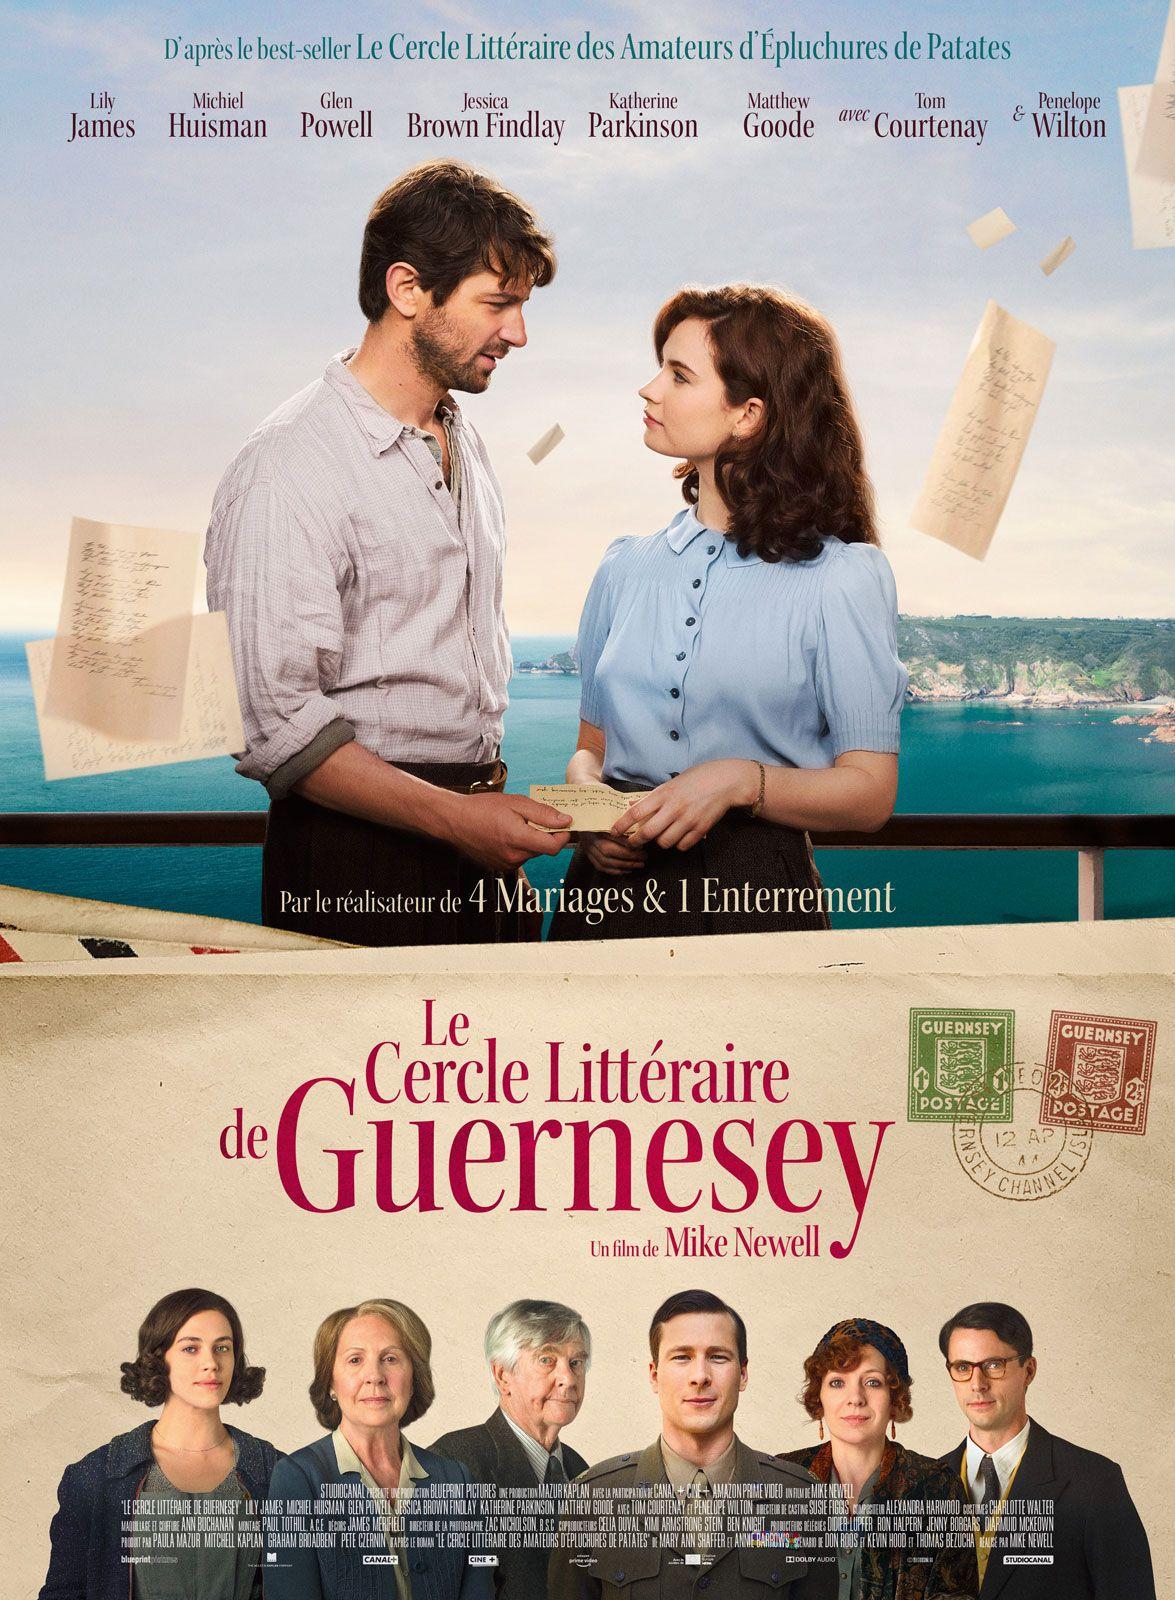 Guernsey The guernsey literary, Peeling potatoes, Potato